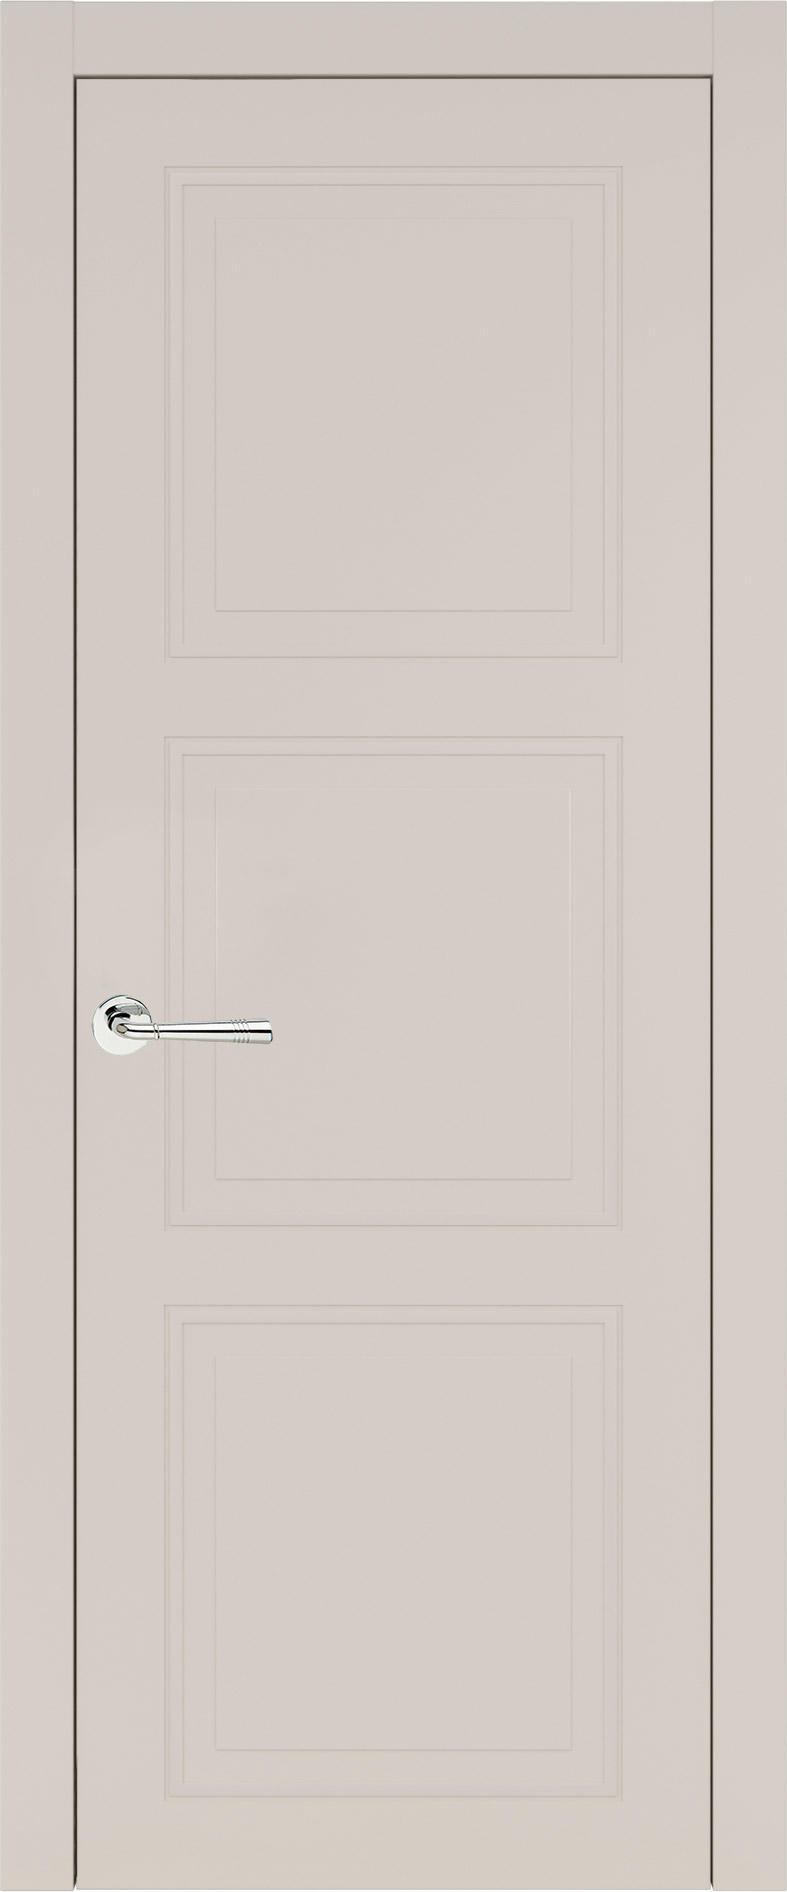 Milano Neo Classic цвет - Жемчужная эмаль (RAL 1013) Без стекла (ДГ)